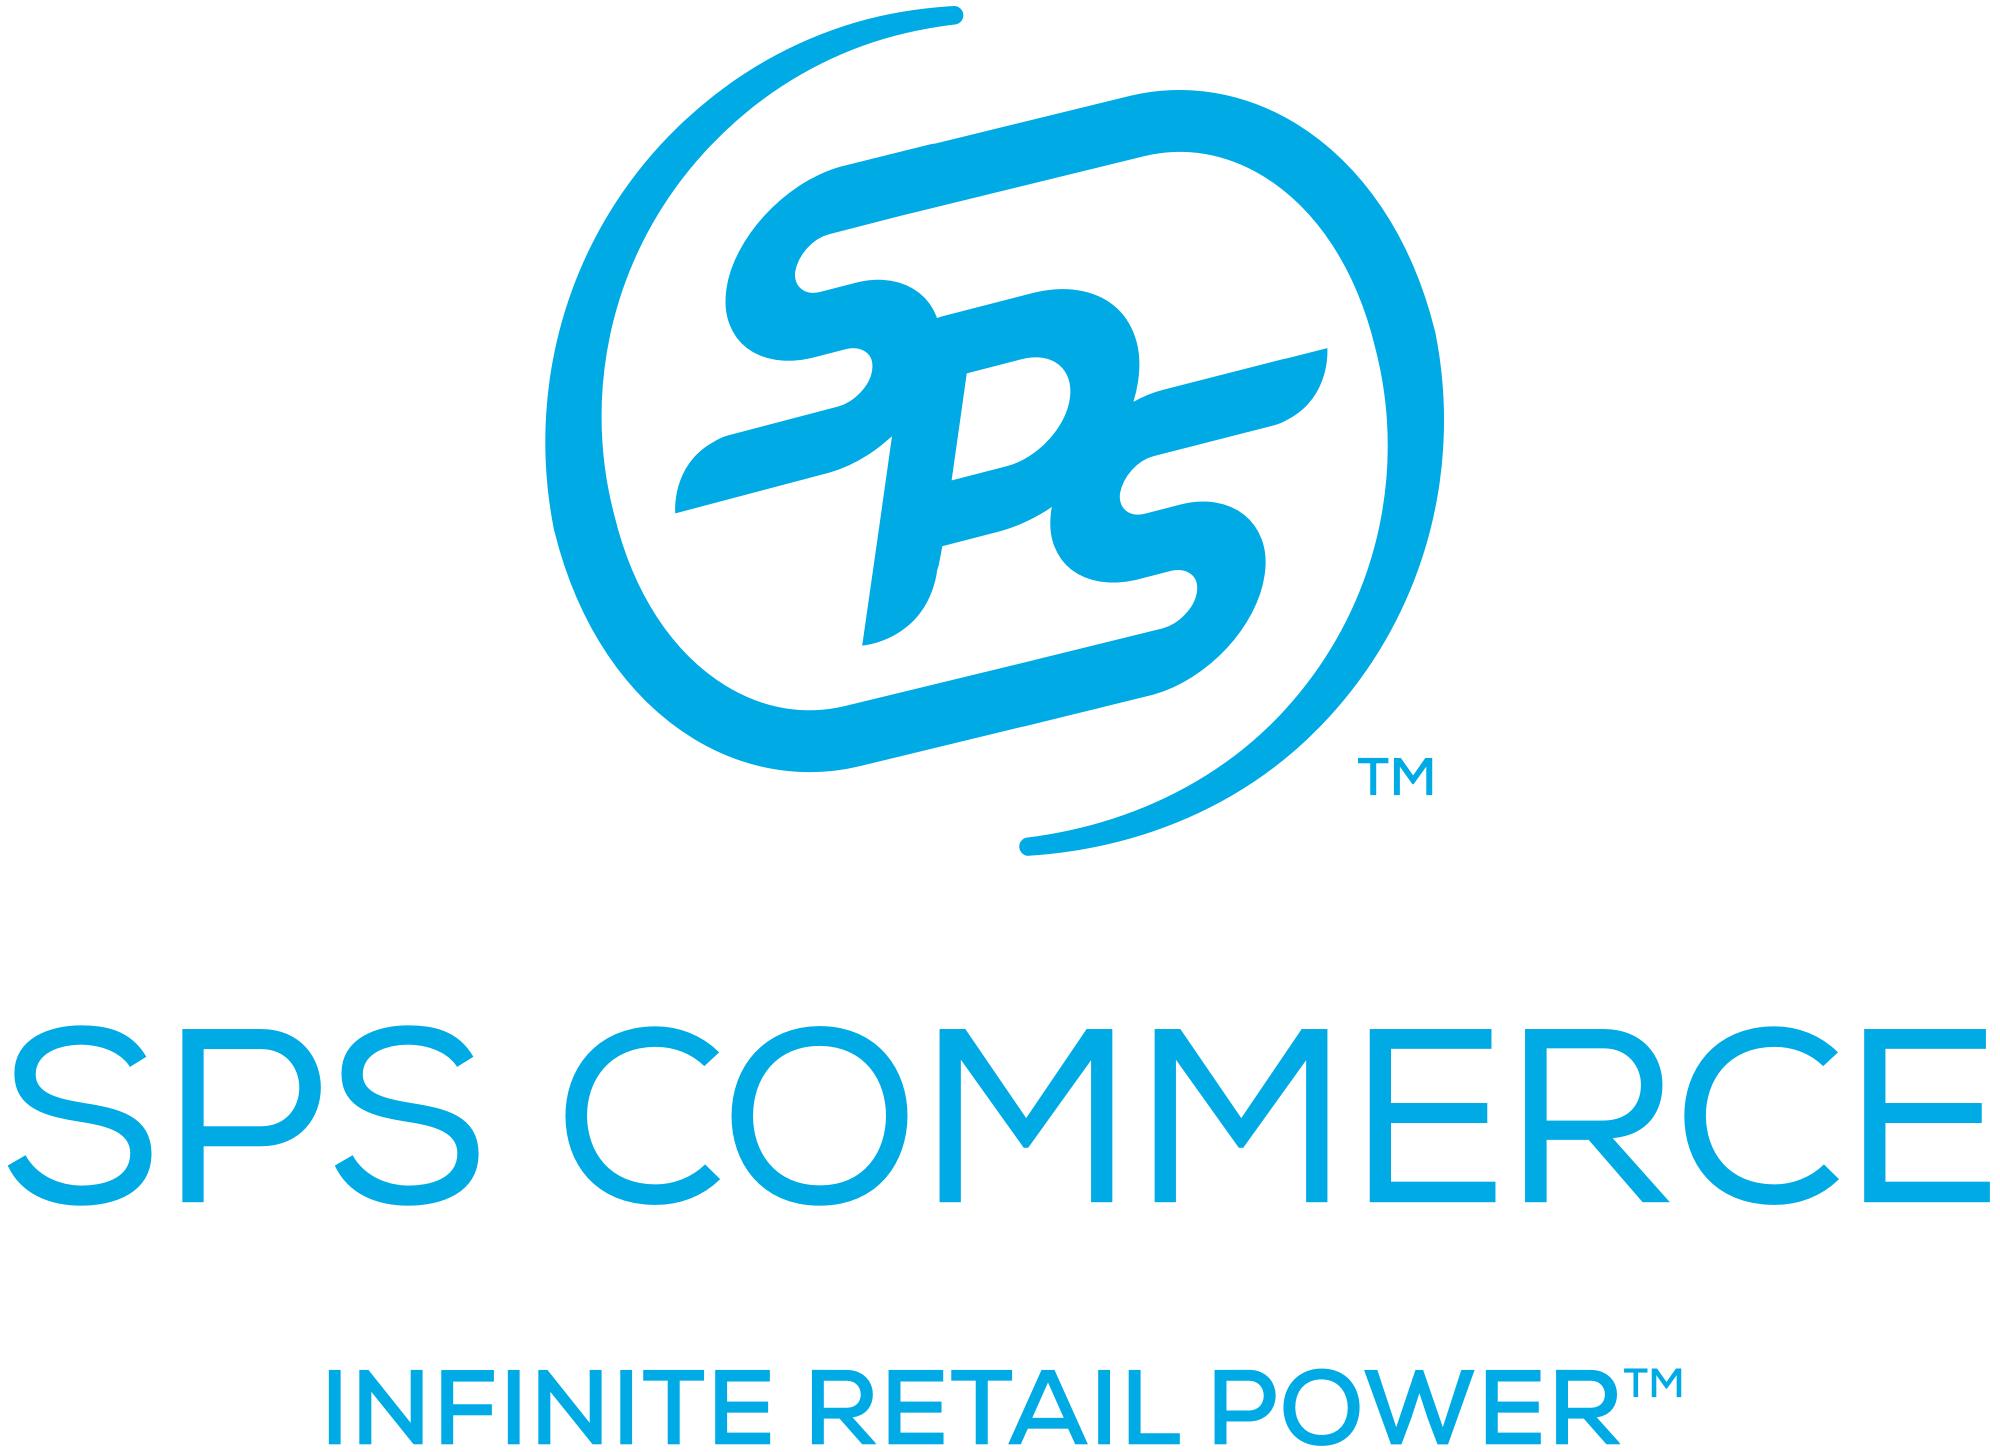 SPS Commerce – Full Service, Fully Embedded EDI Solution for Acumatica - SPS Commerce